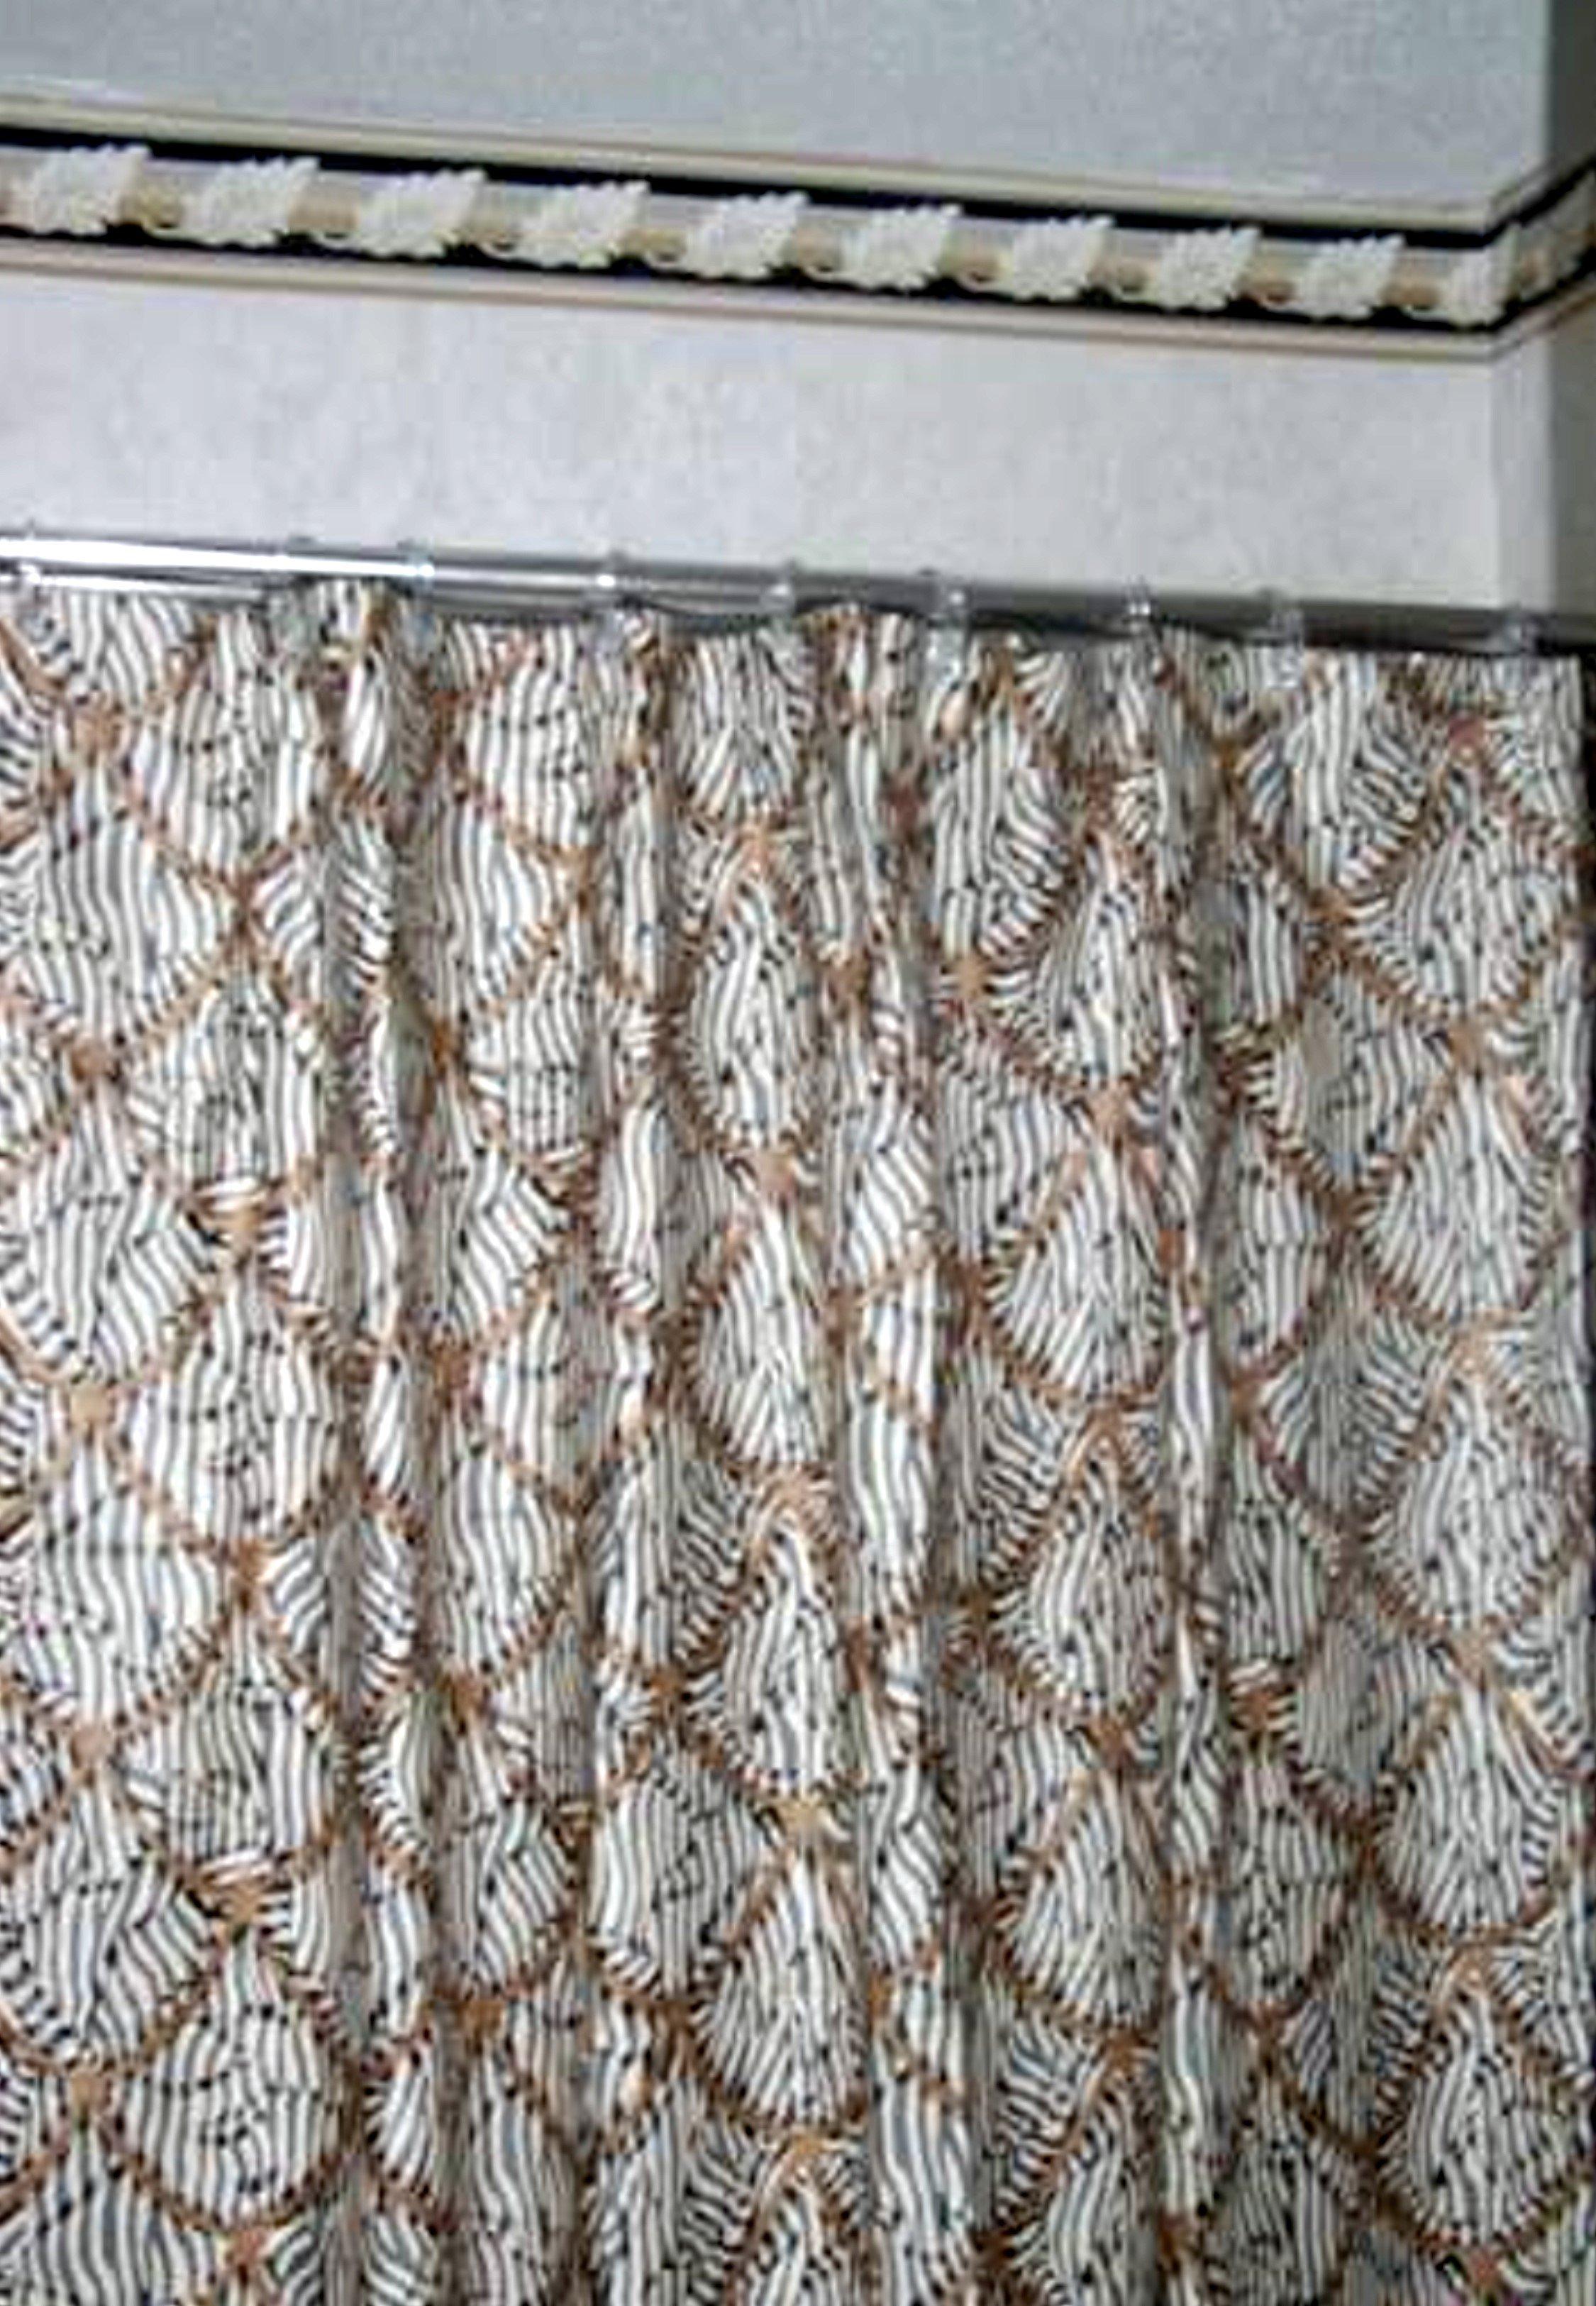 Solid teal shower curtain - Solid Black Shower Curtain Black And Gray Fabric Shower Curtain Teal And Black Shower Curtain